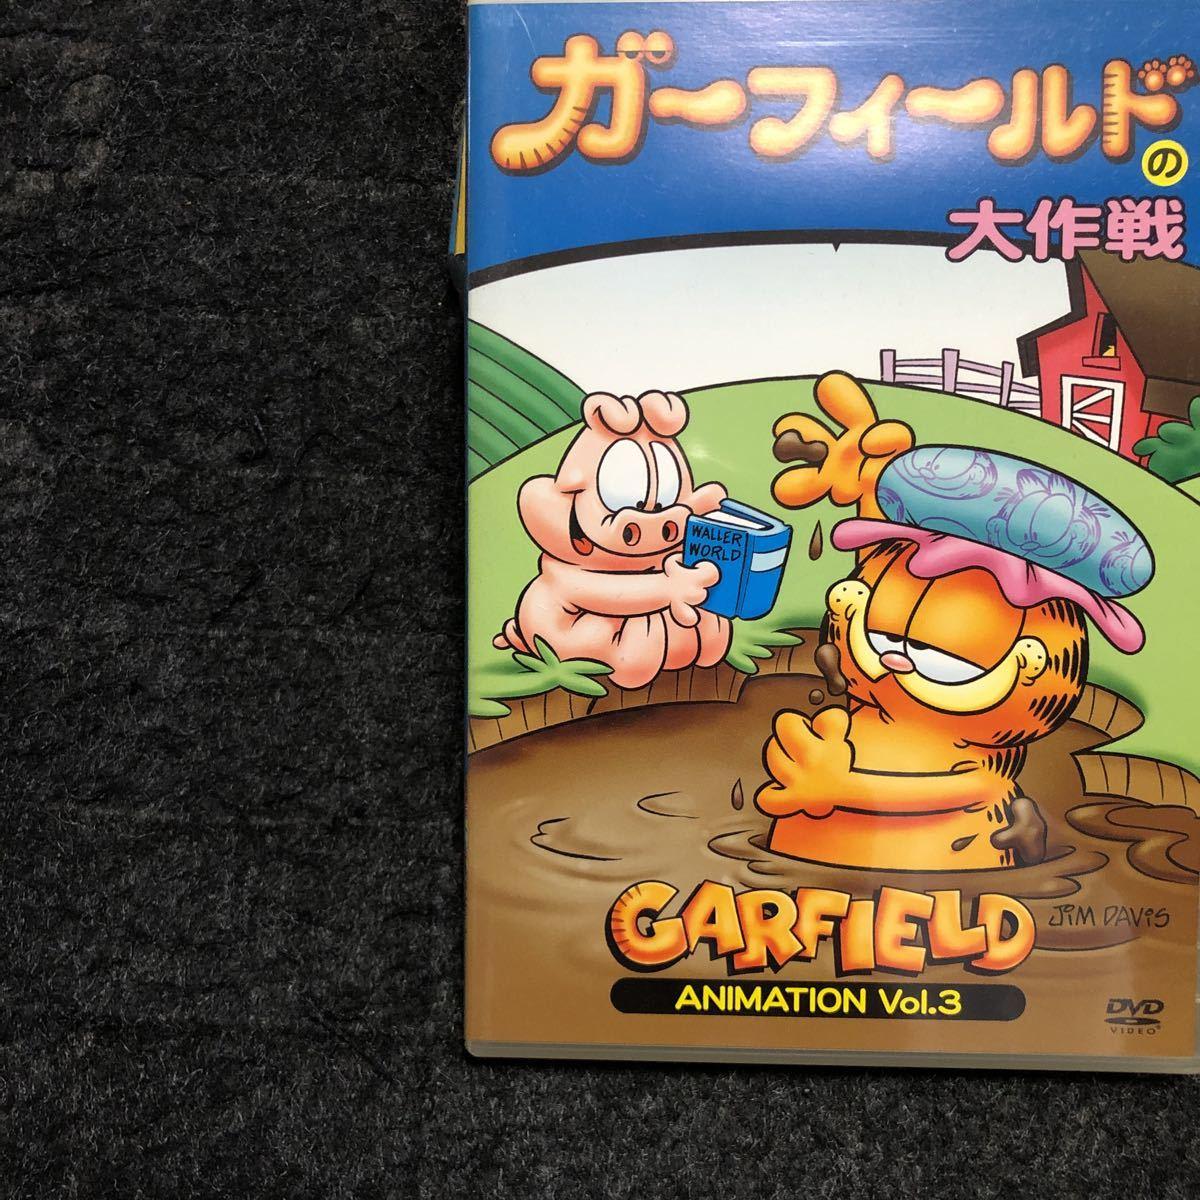 GARFIELD DVD 定形外郵便料金込み!!ガ-フィ-ルドの大作戦 ガ-フィ-ルドの家出 JIM Davis